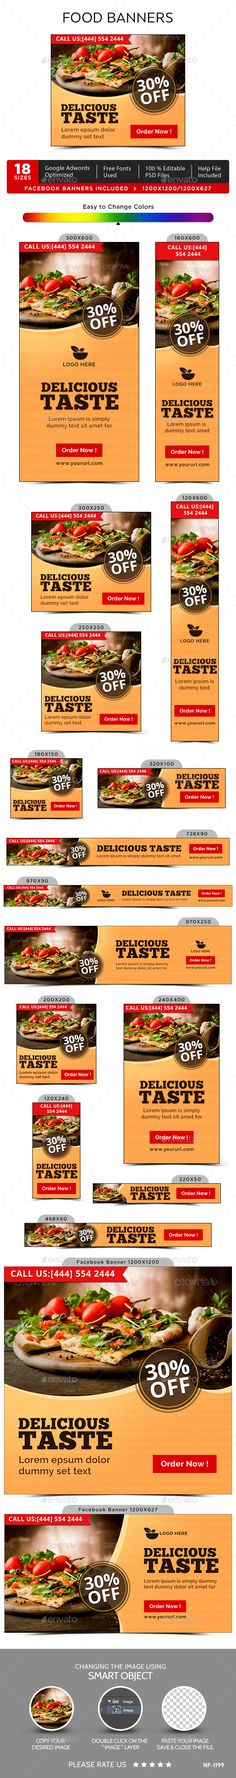 Food & Restaurant Banners